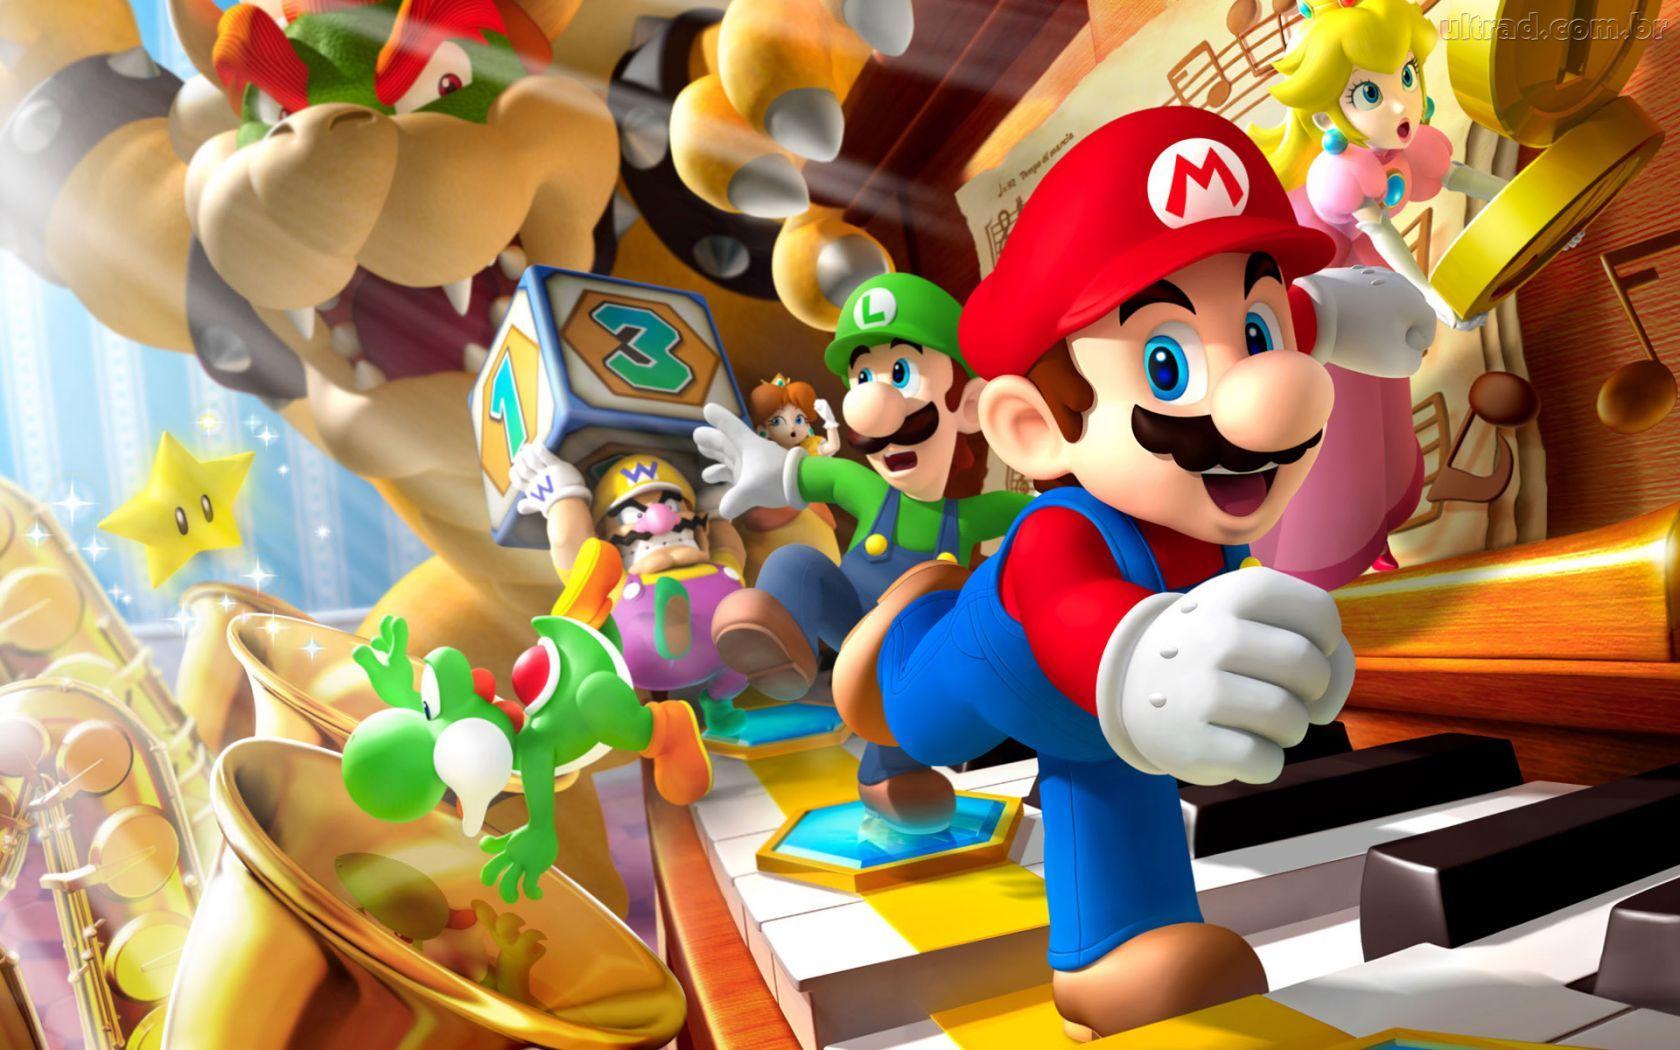 Pin De Felipe Tim Beta Em Mario World Mario Party Jogo Do Mario Super Mario Bros